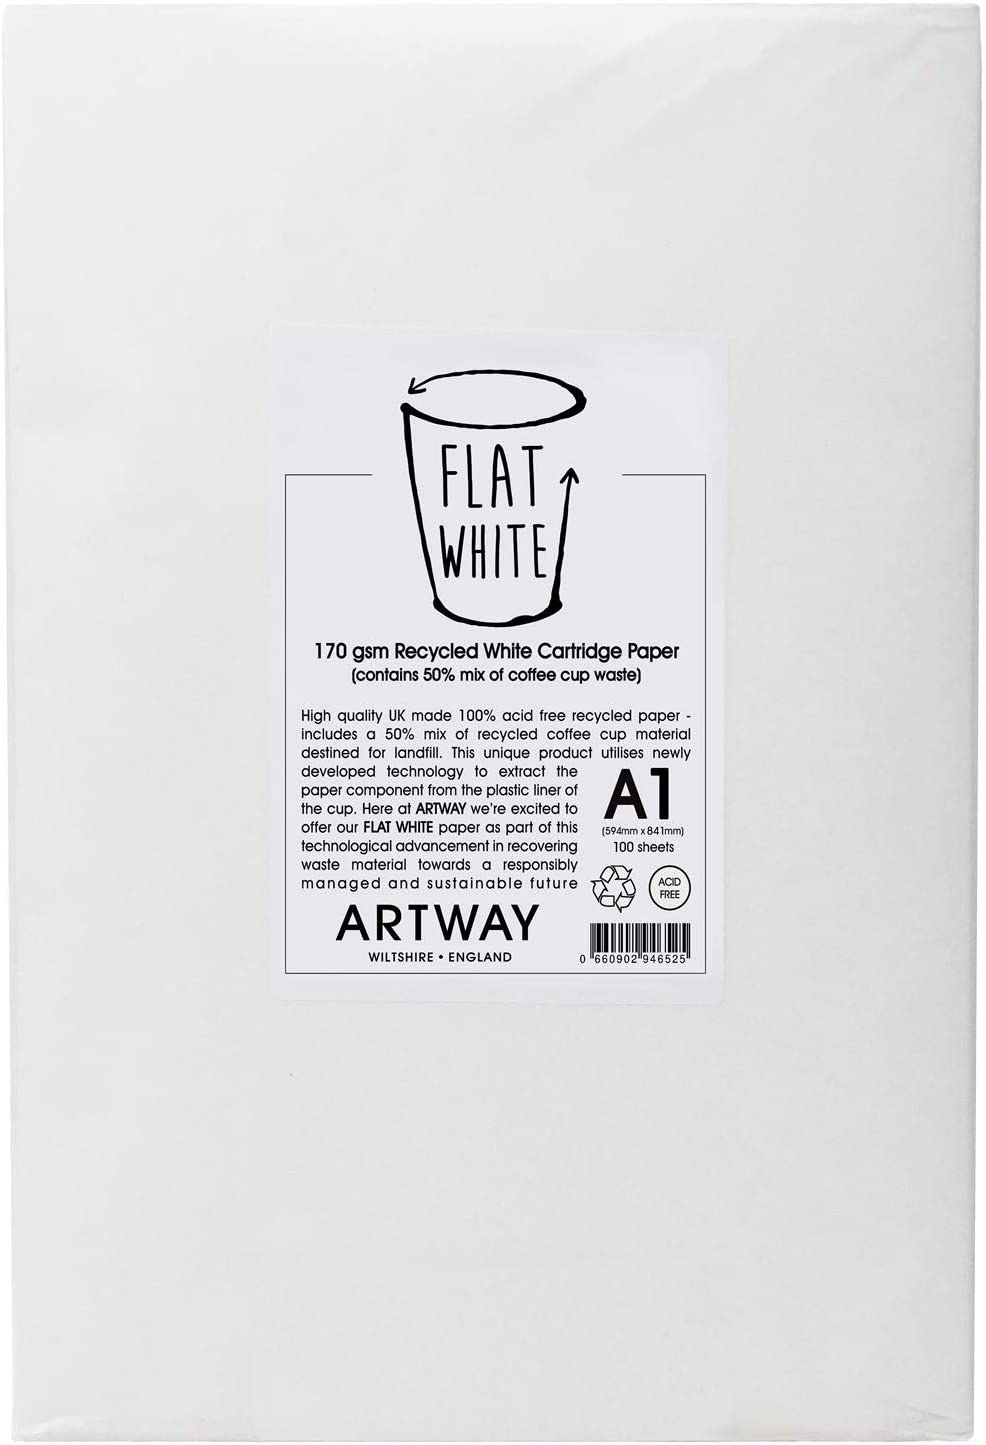 Artway A1-100 feuilles Papier cartouche Flat White 100/% recycl/é//dont 50/% en gobelets en carton 170 g//m/²